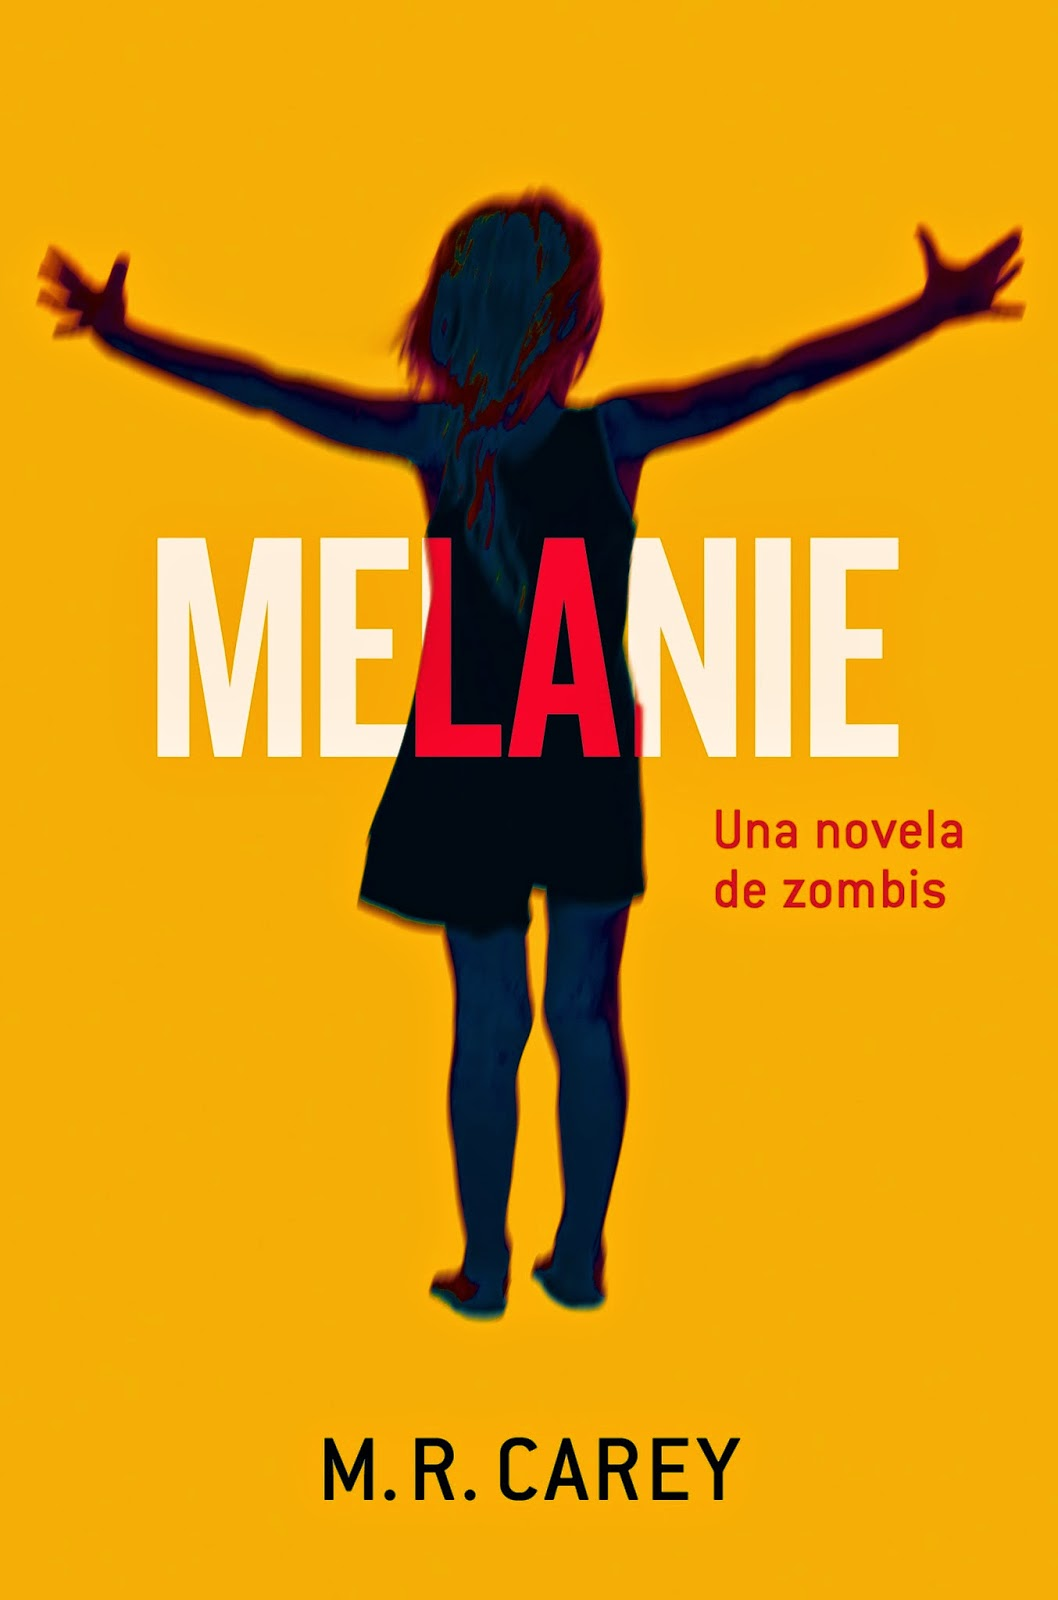 http://labibliotecadebella.blogspot.com.es/2015/12/melanie-m-r-carey.html